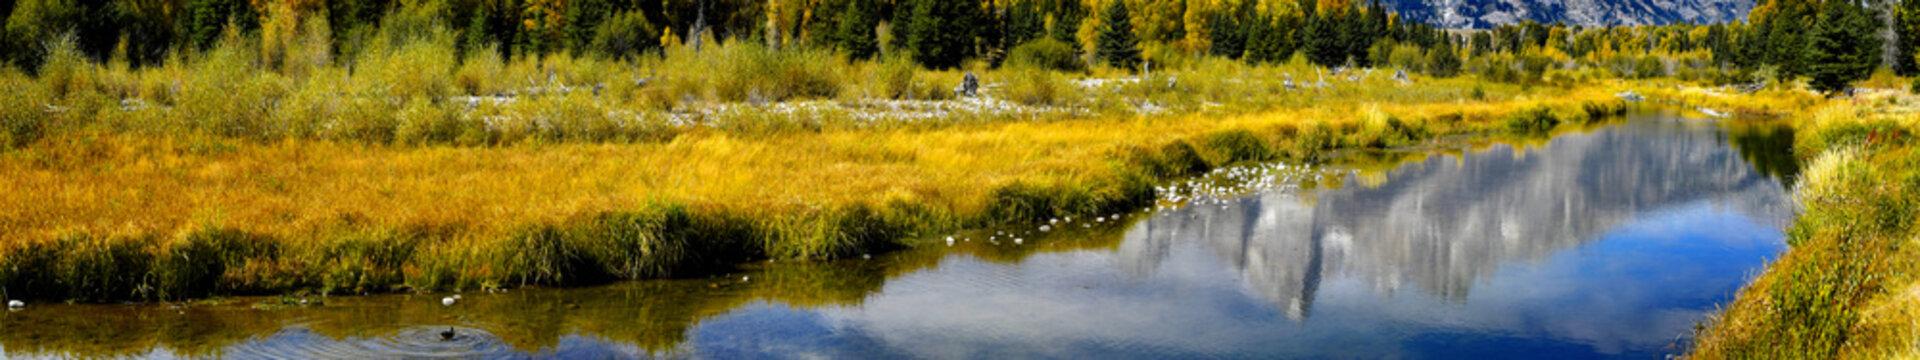 Web banner of the Snake River at Grand Teton National Park.